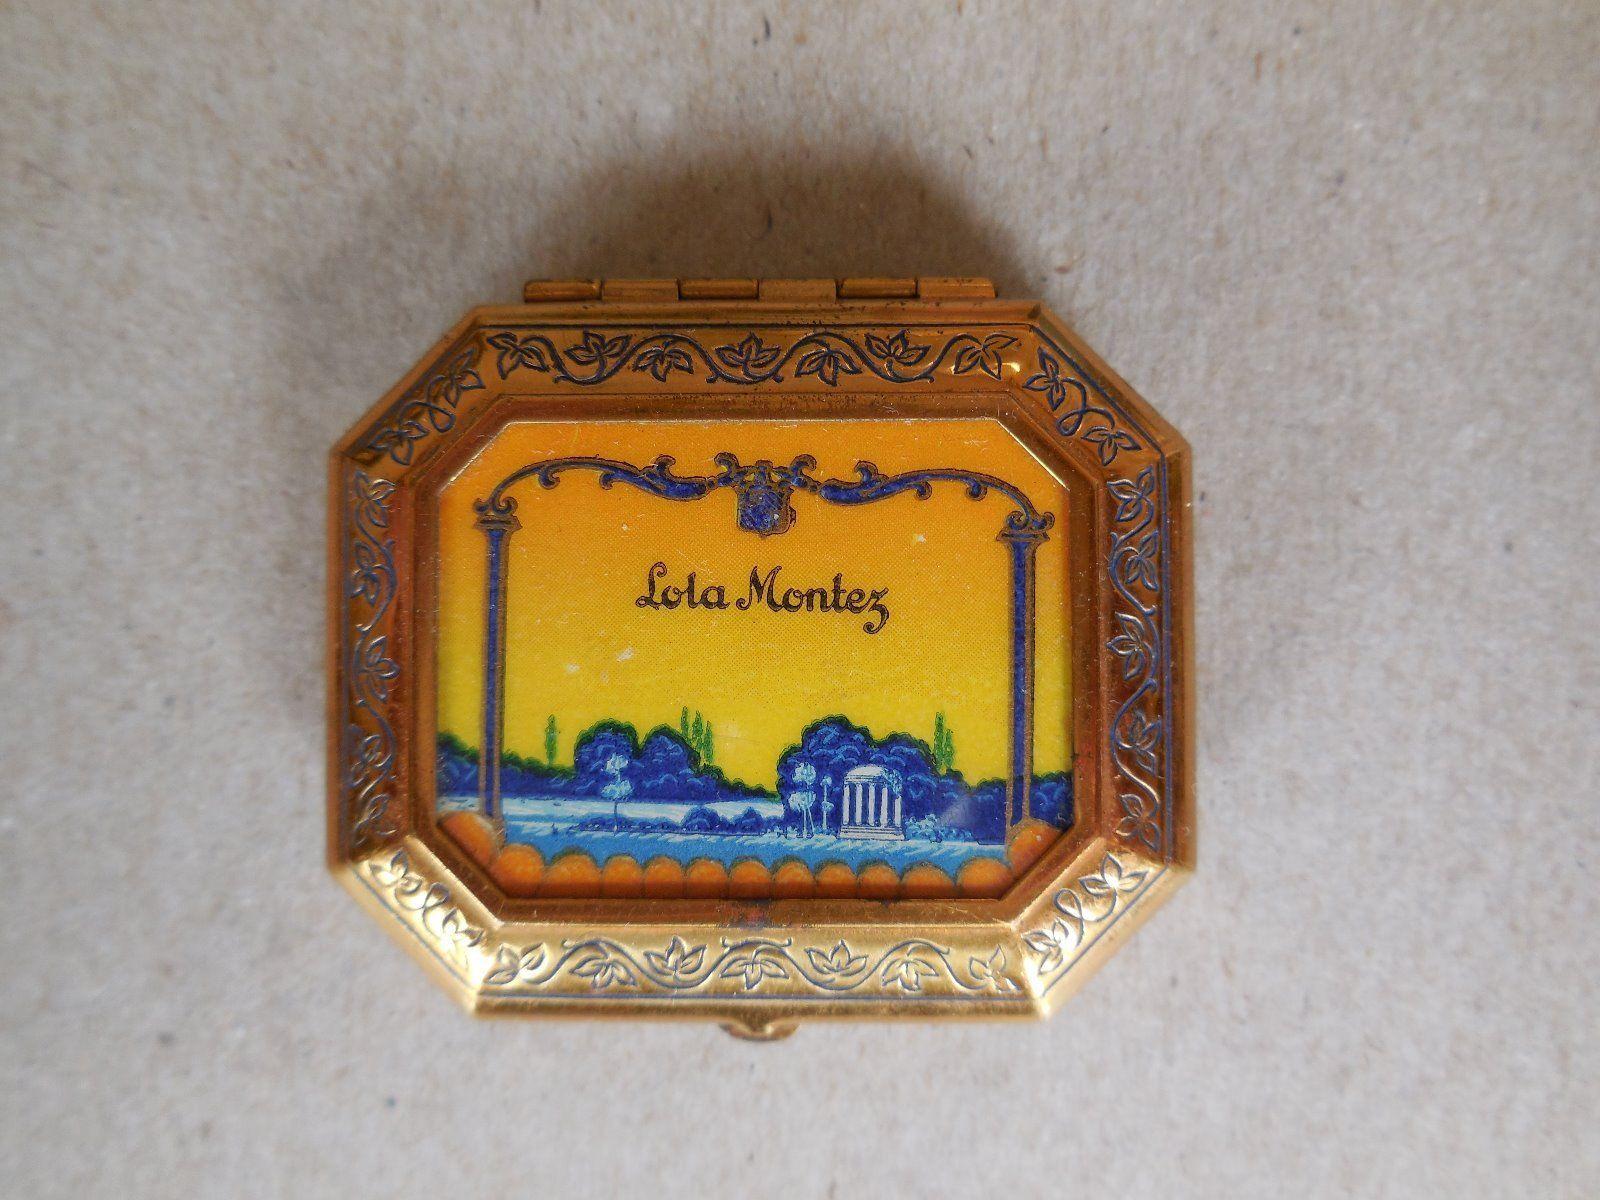 Lola Montez 1920's Compact by Darnee Perfumer New York